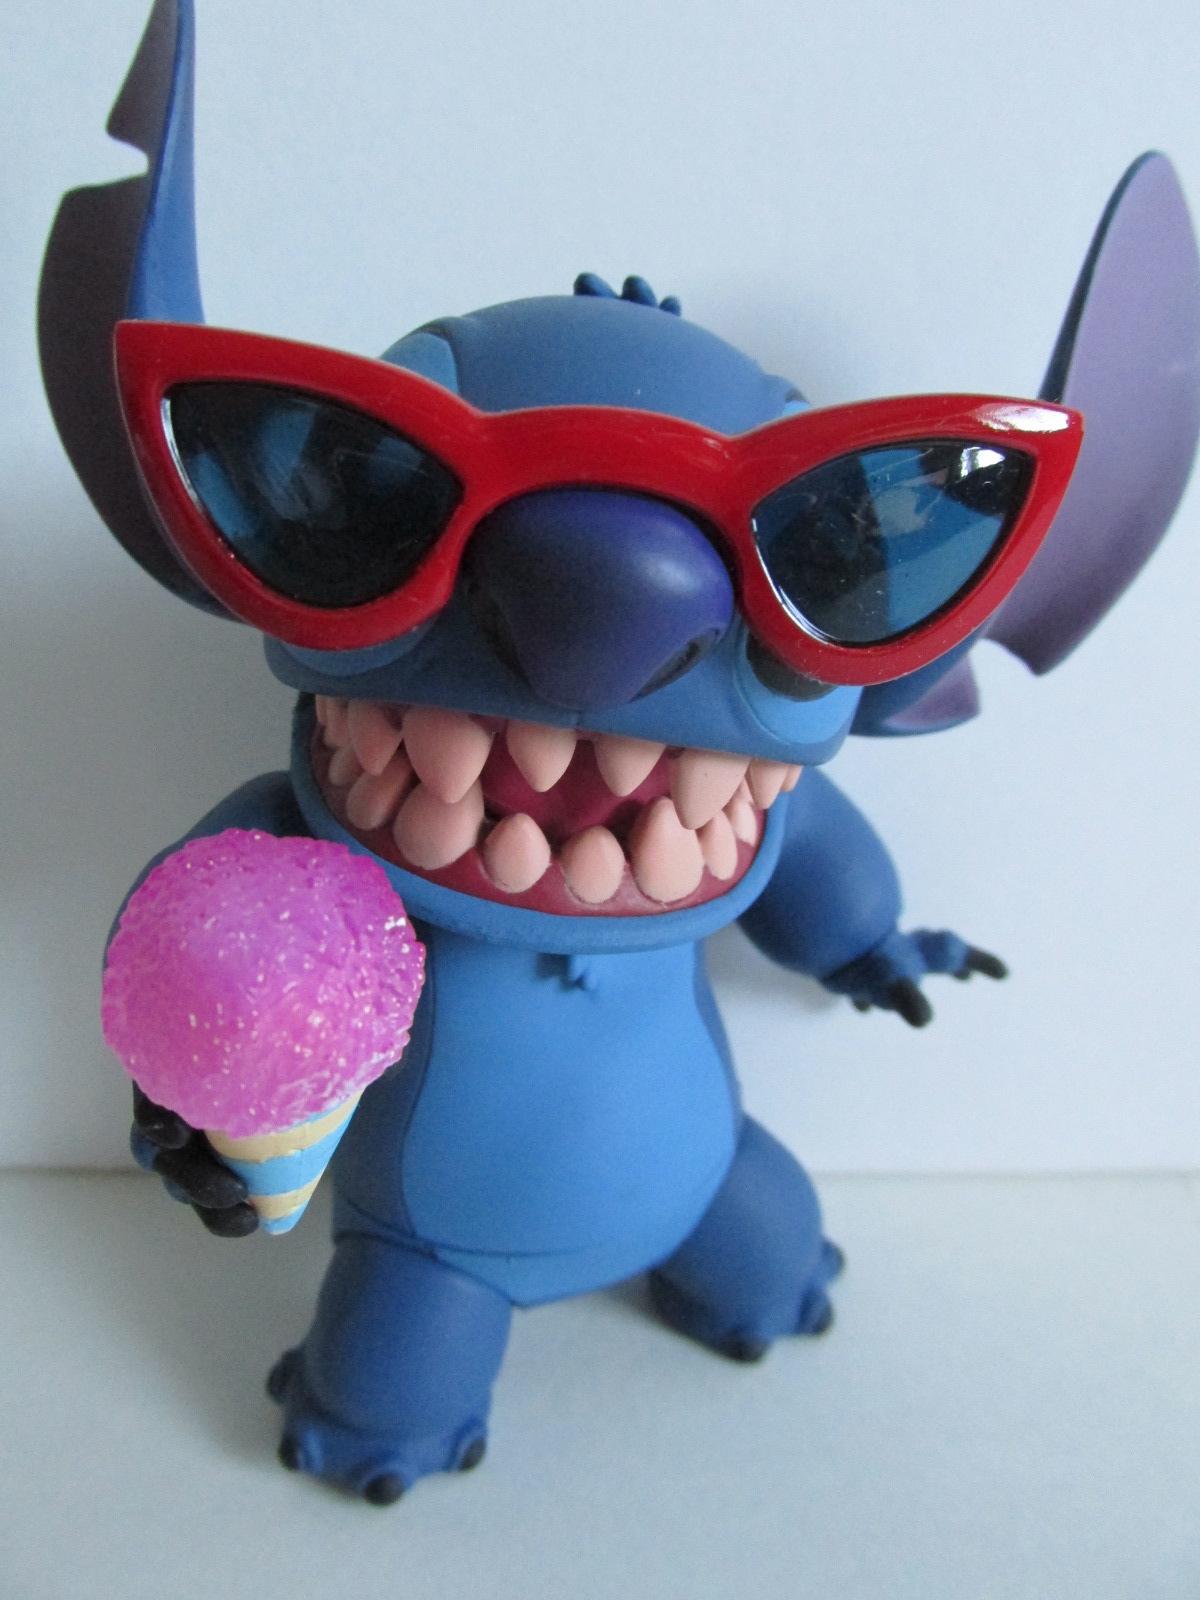 64b2ab0bb6d293 Stitch With Sunglasses